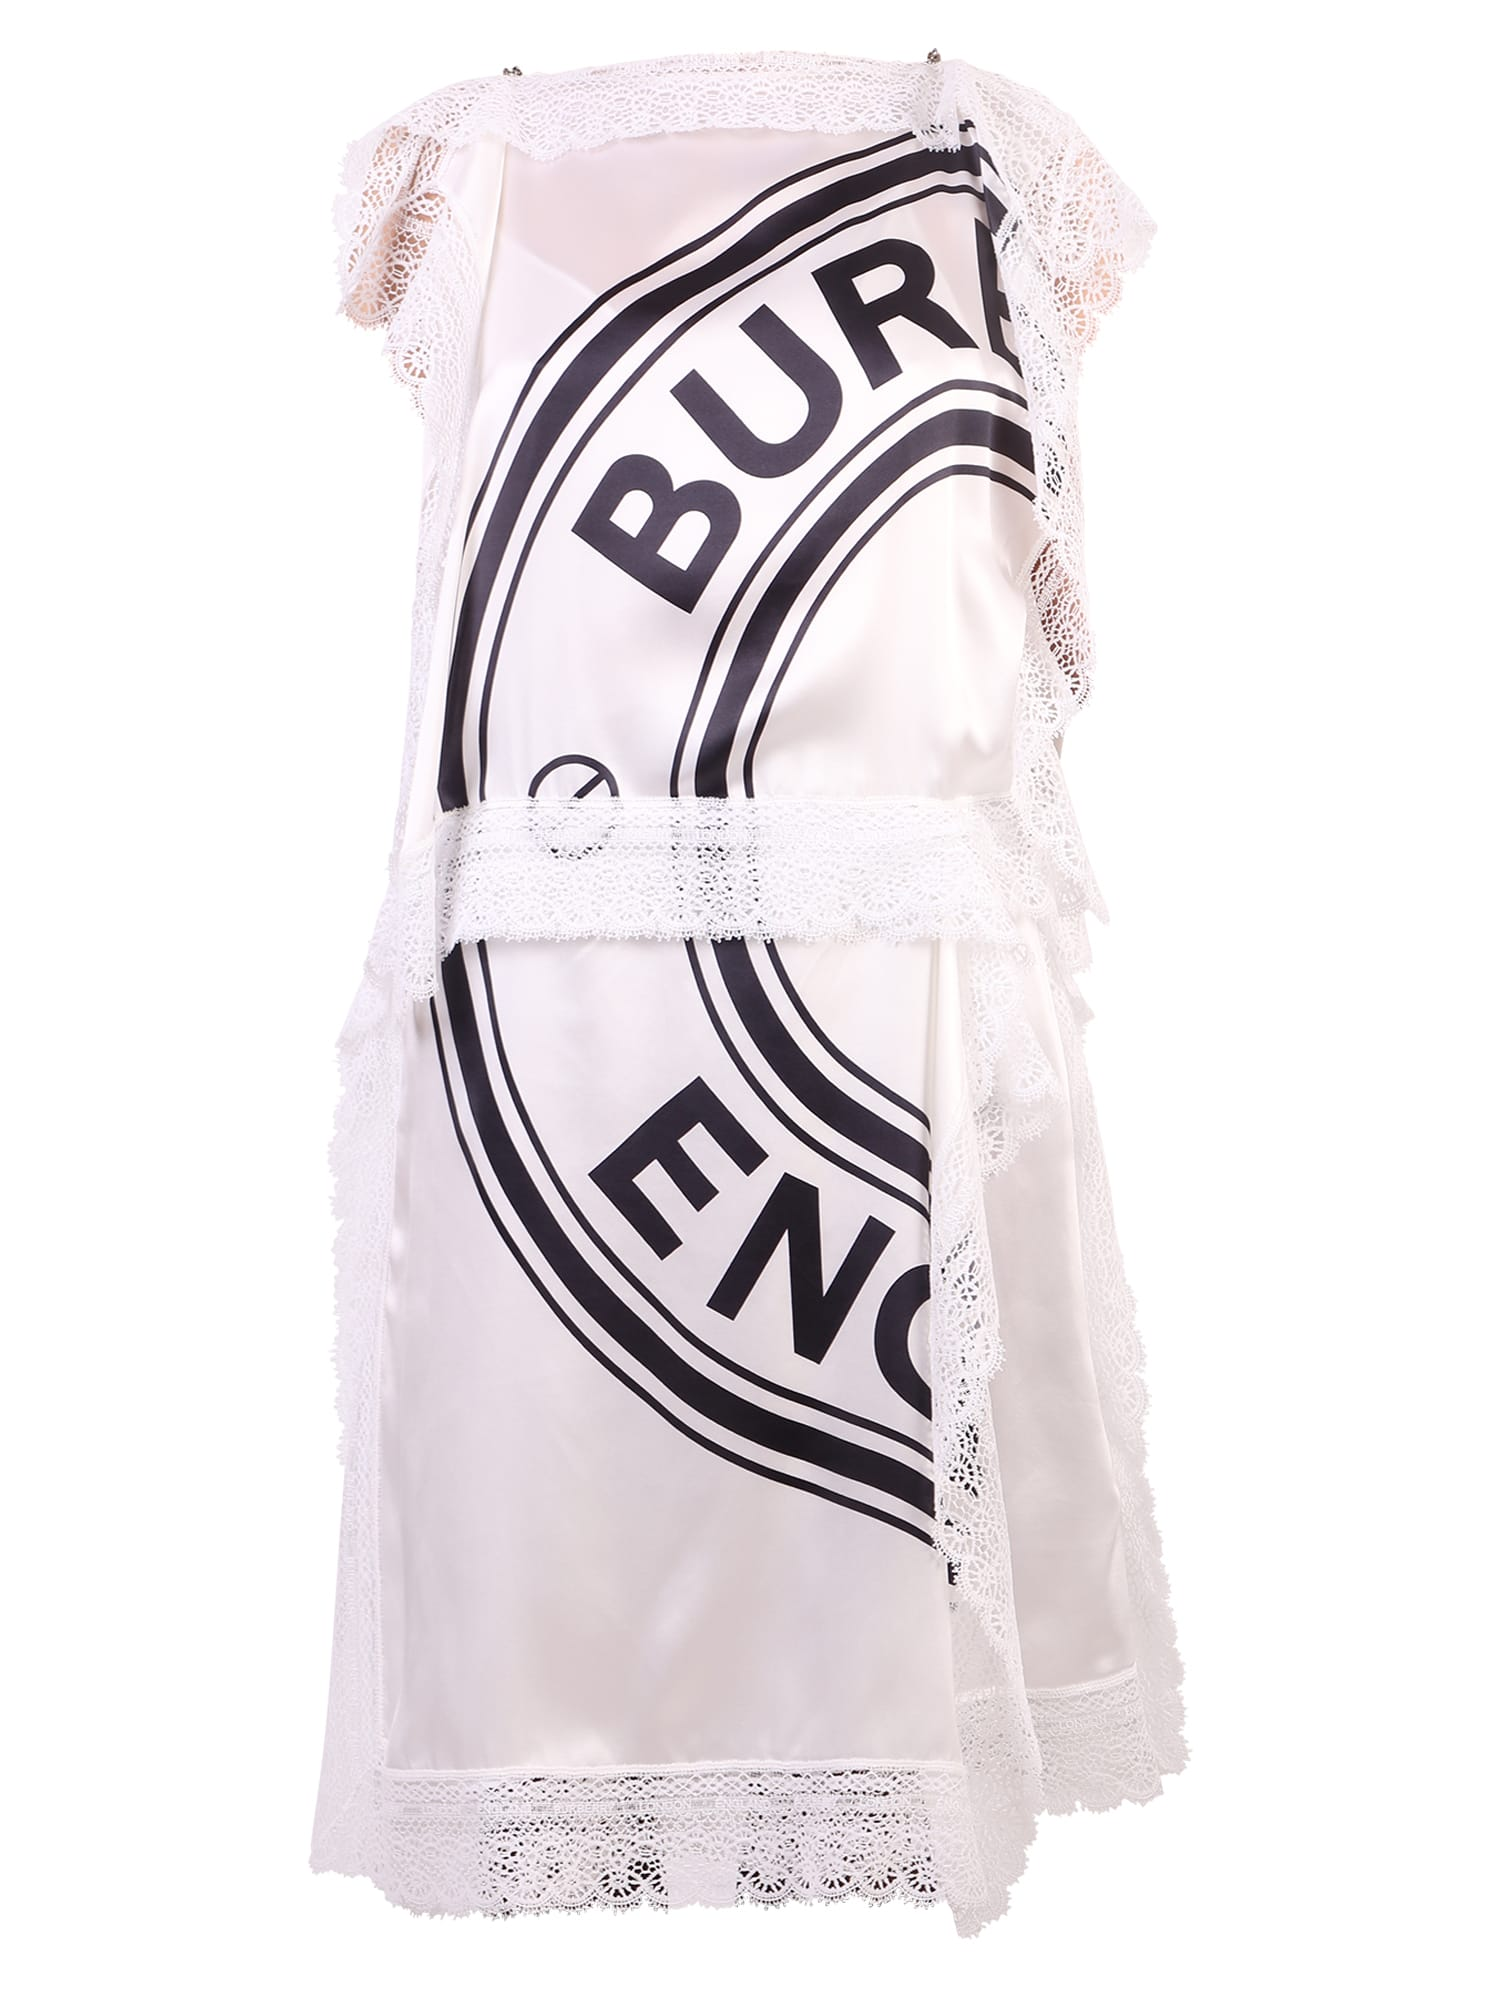 Burberry Branded Dress